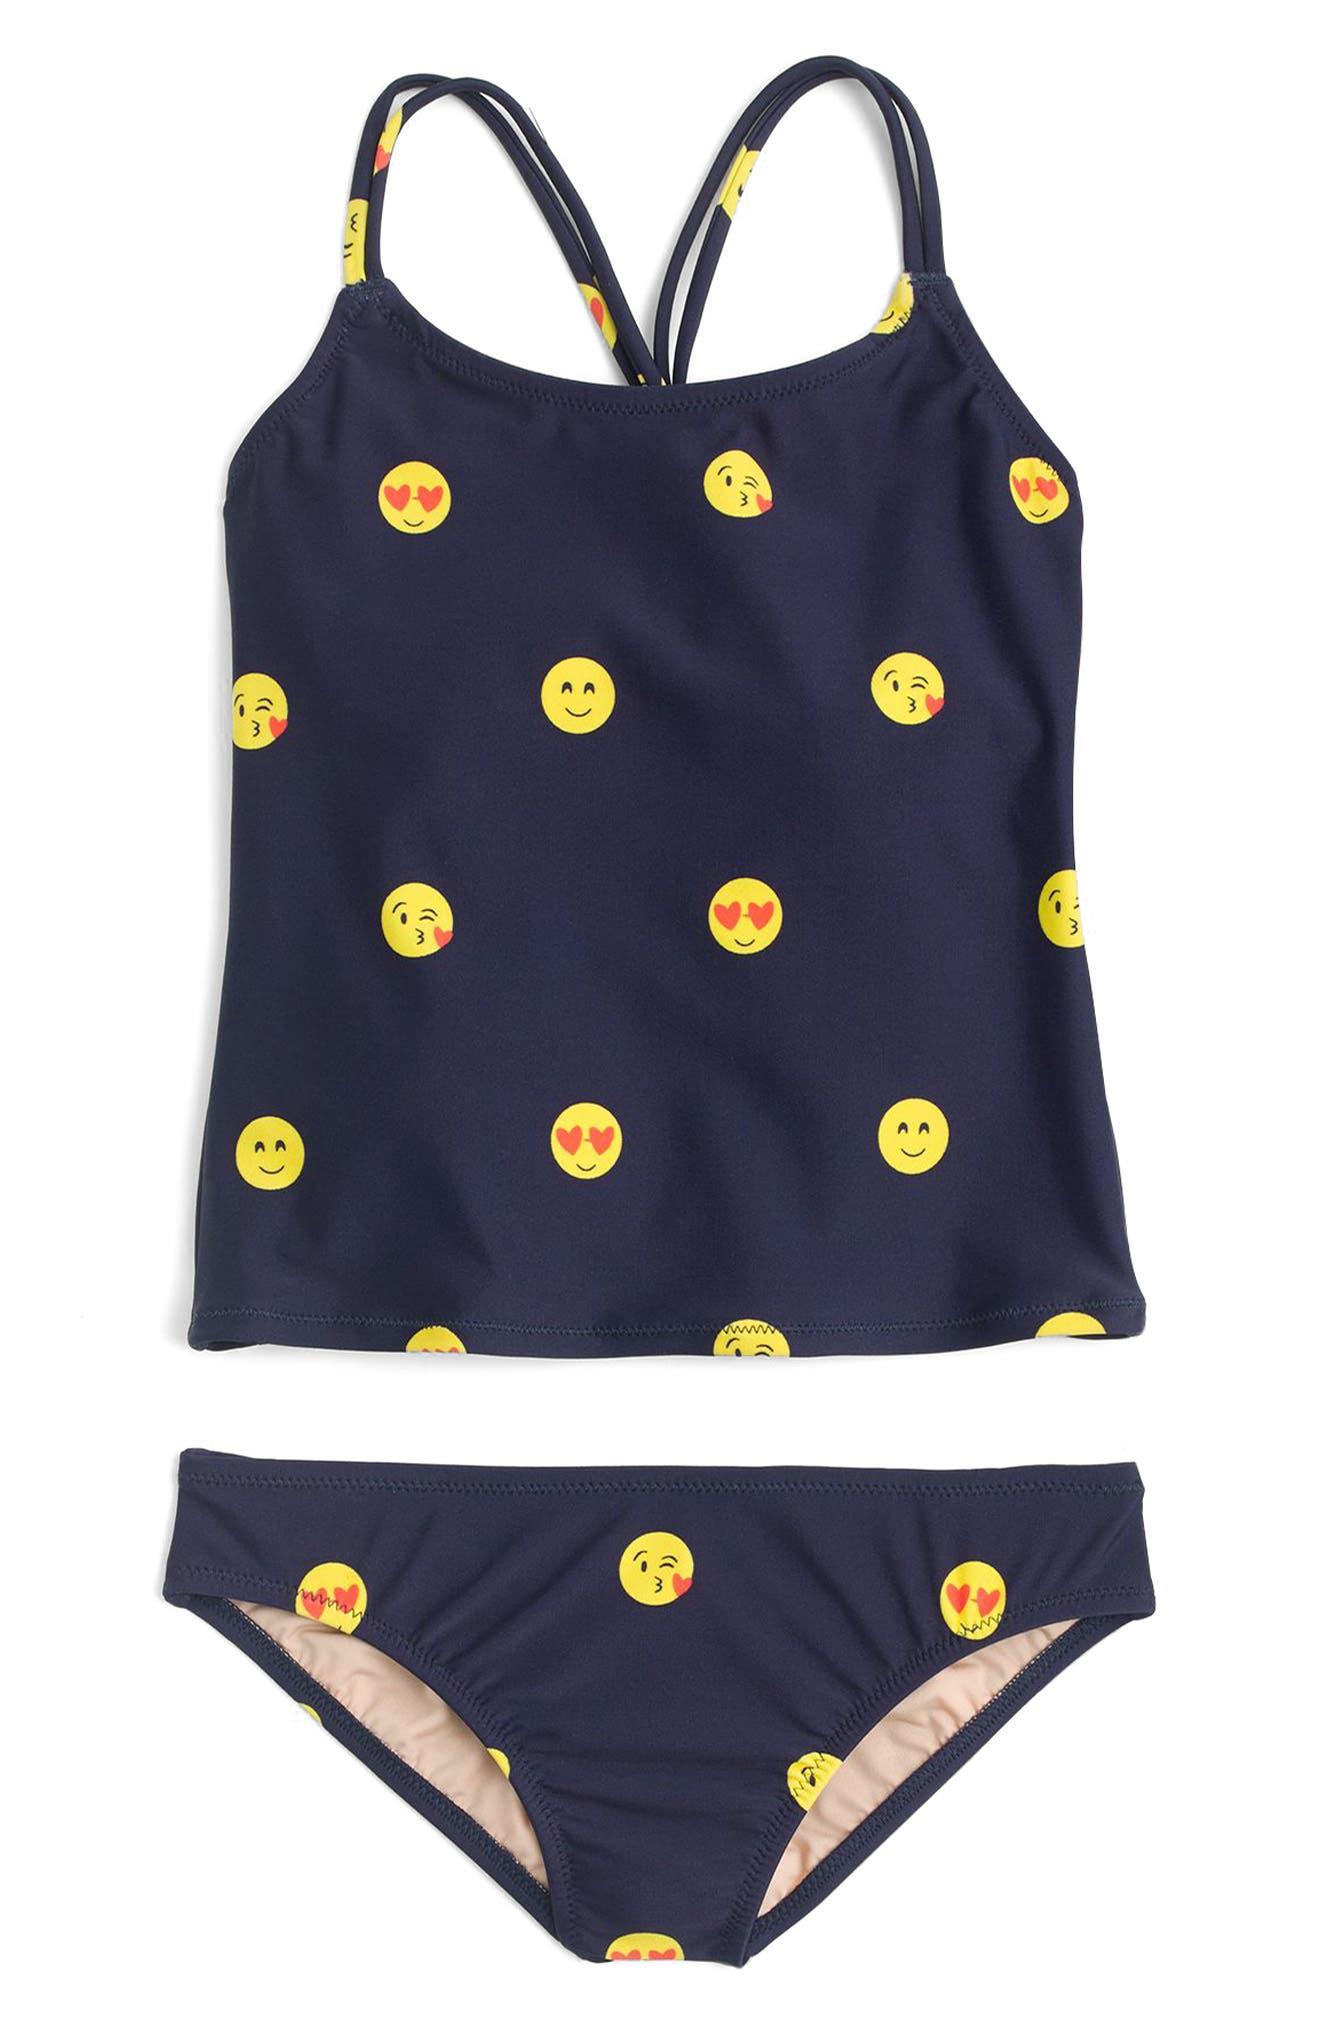 Emoji Two-Piece Swimsuit,                         Main,                         color, Navy/ Lemon